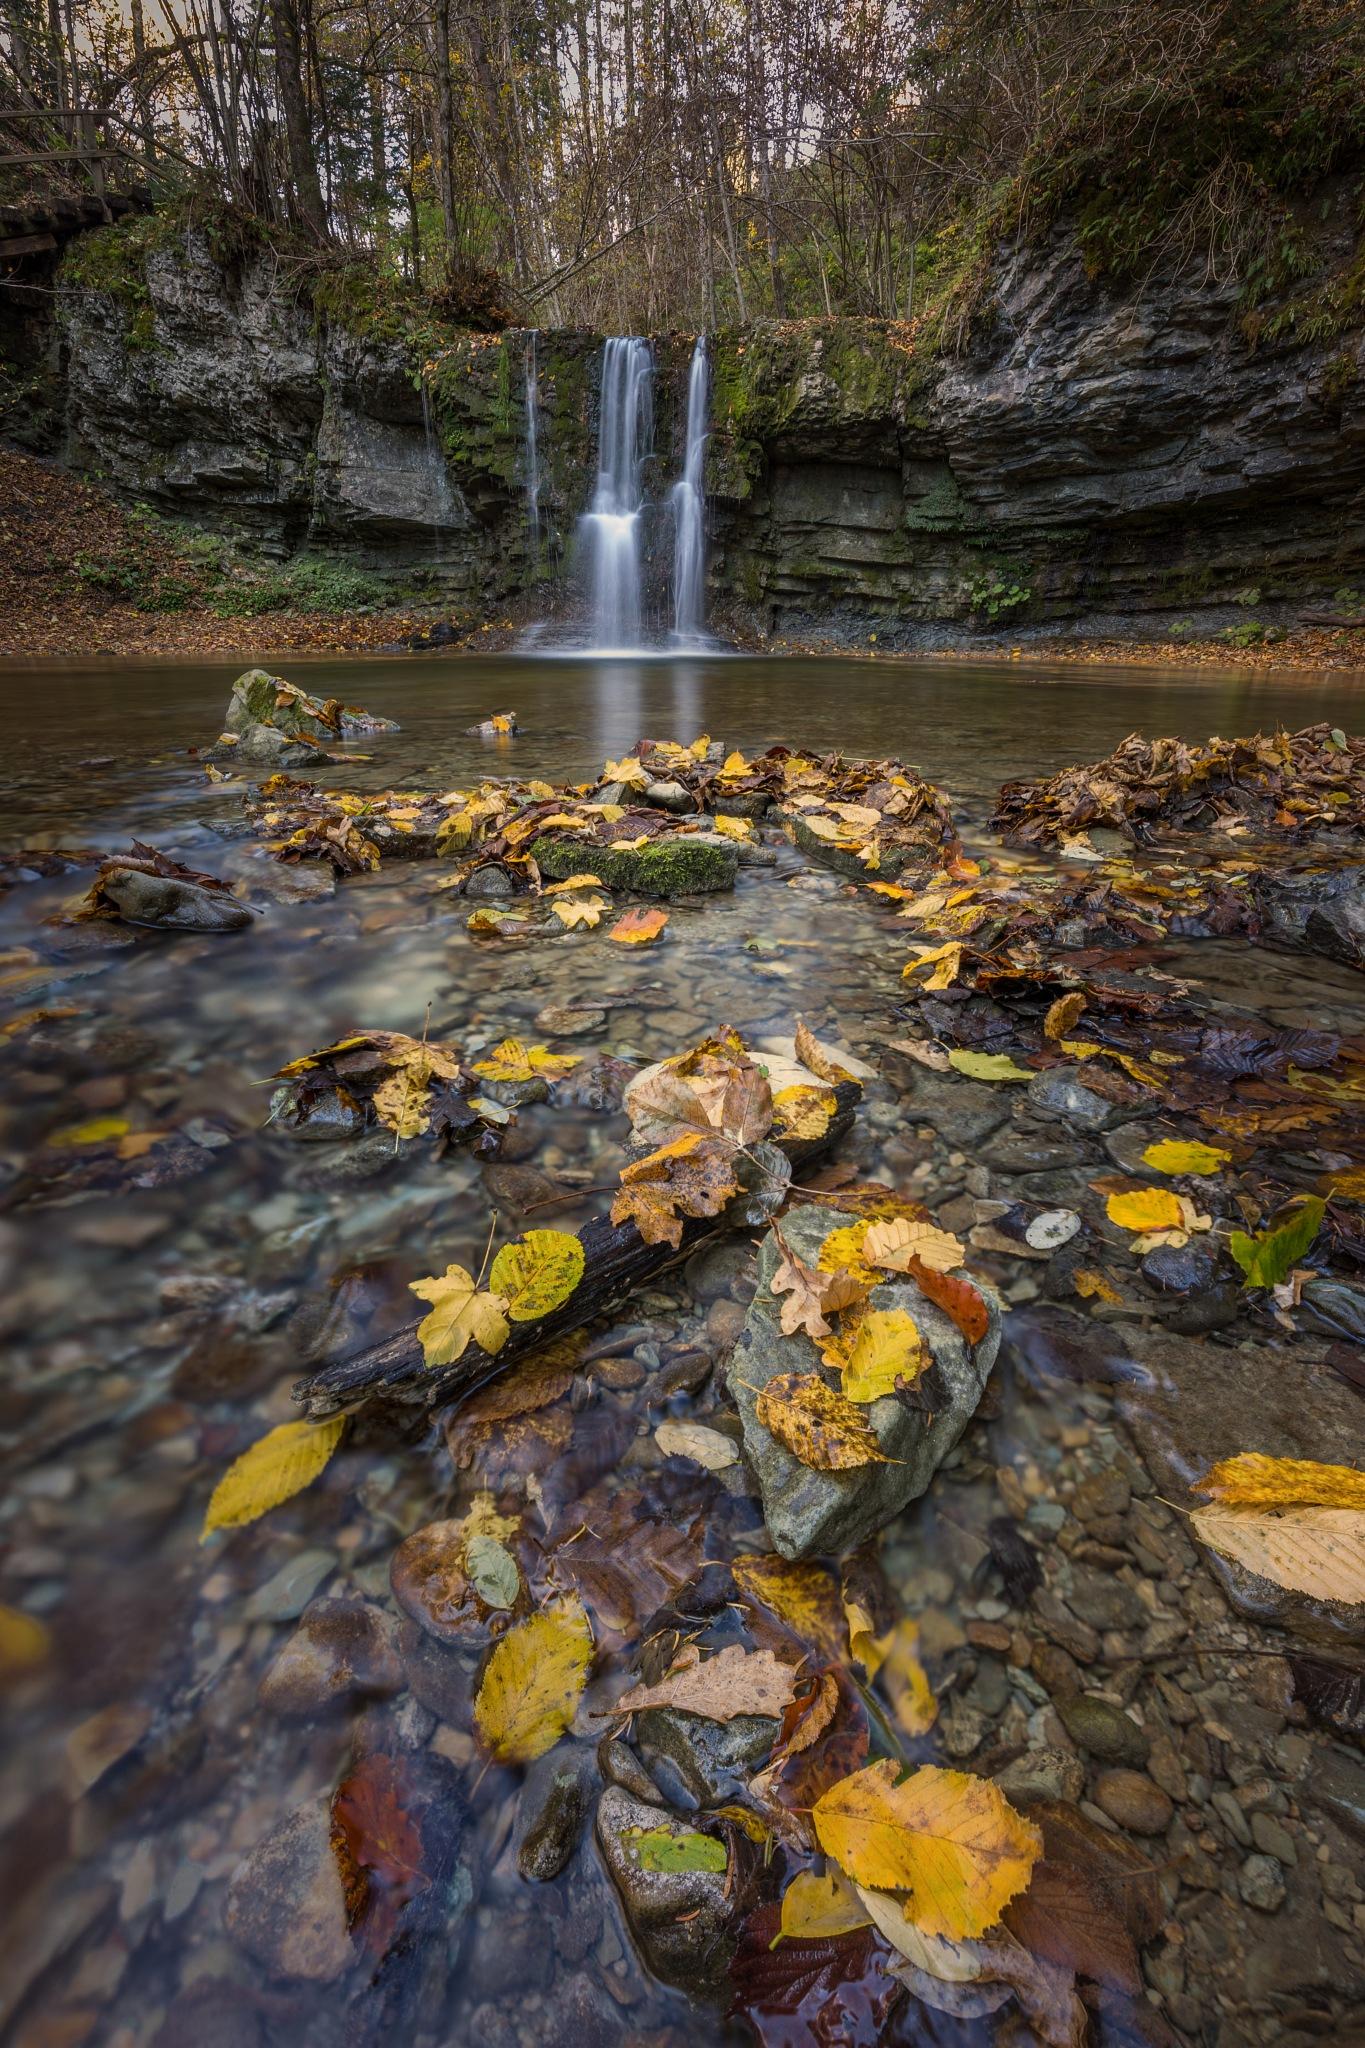 Autumn creek with waterfall by Bor Rojnik